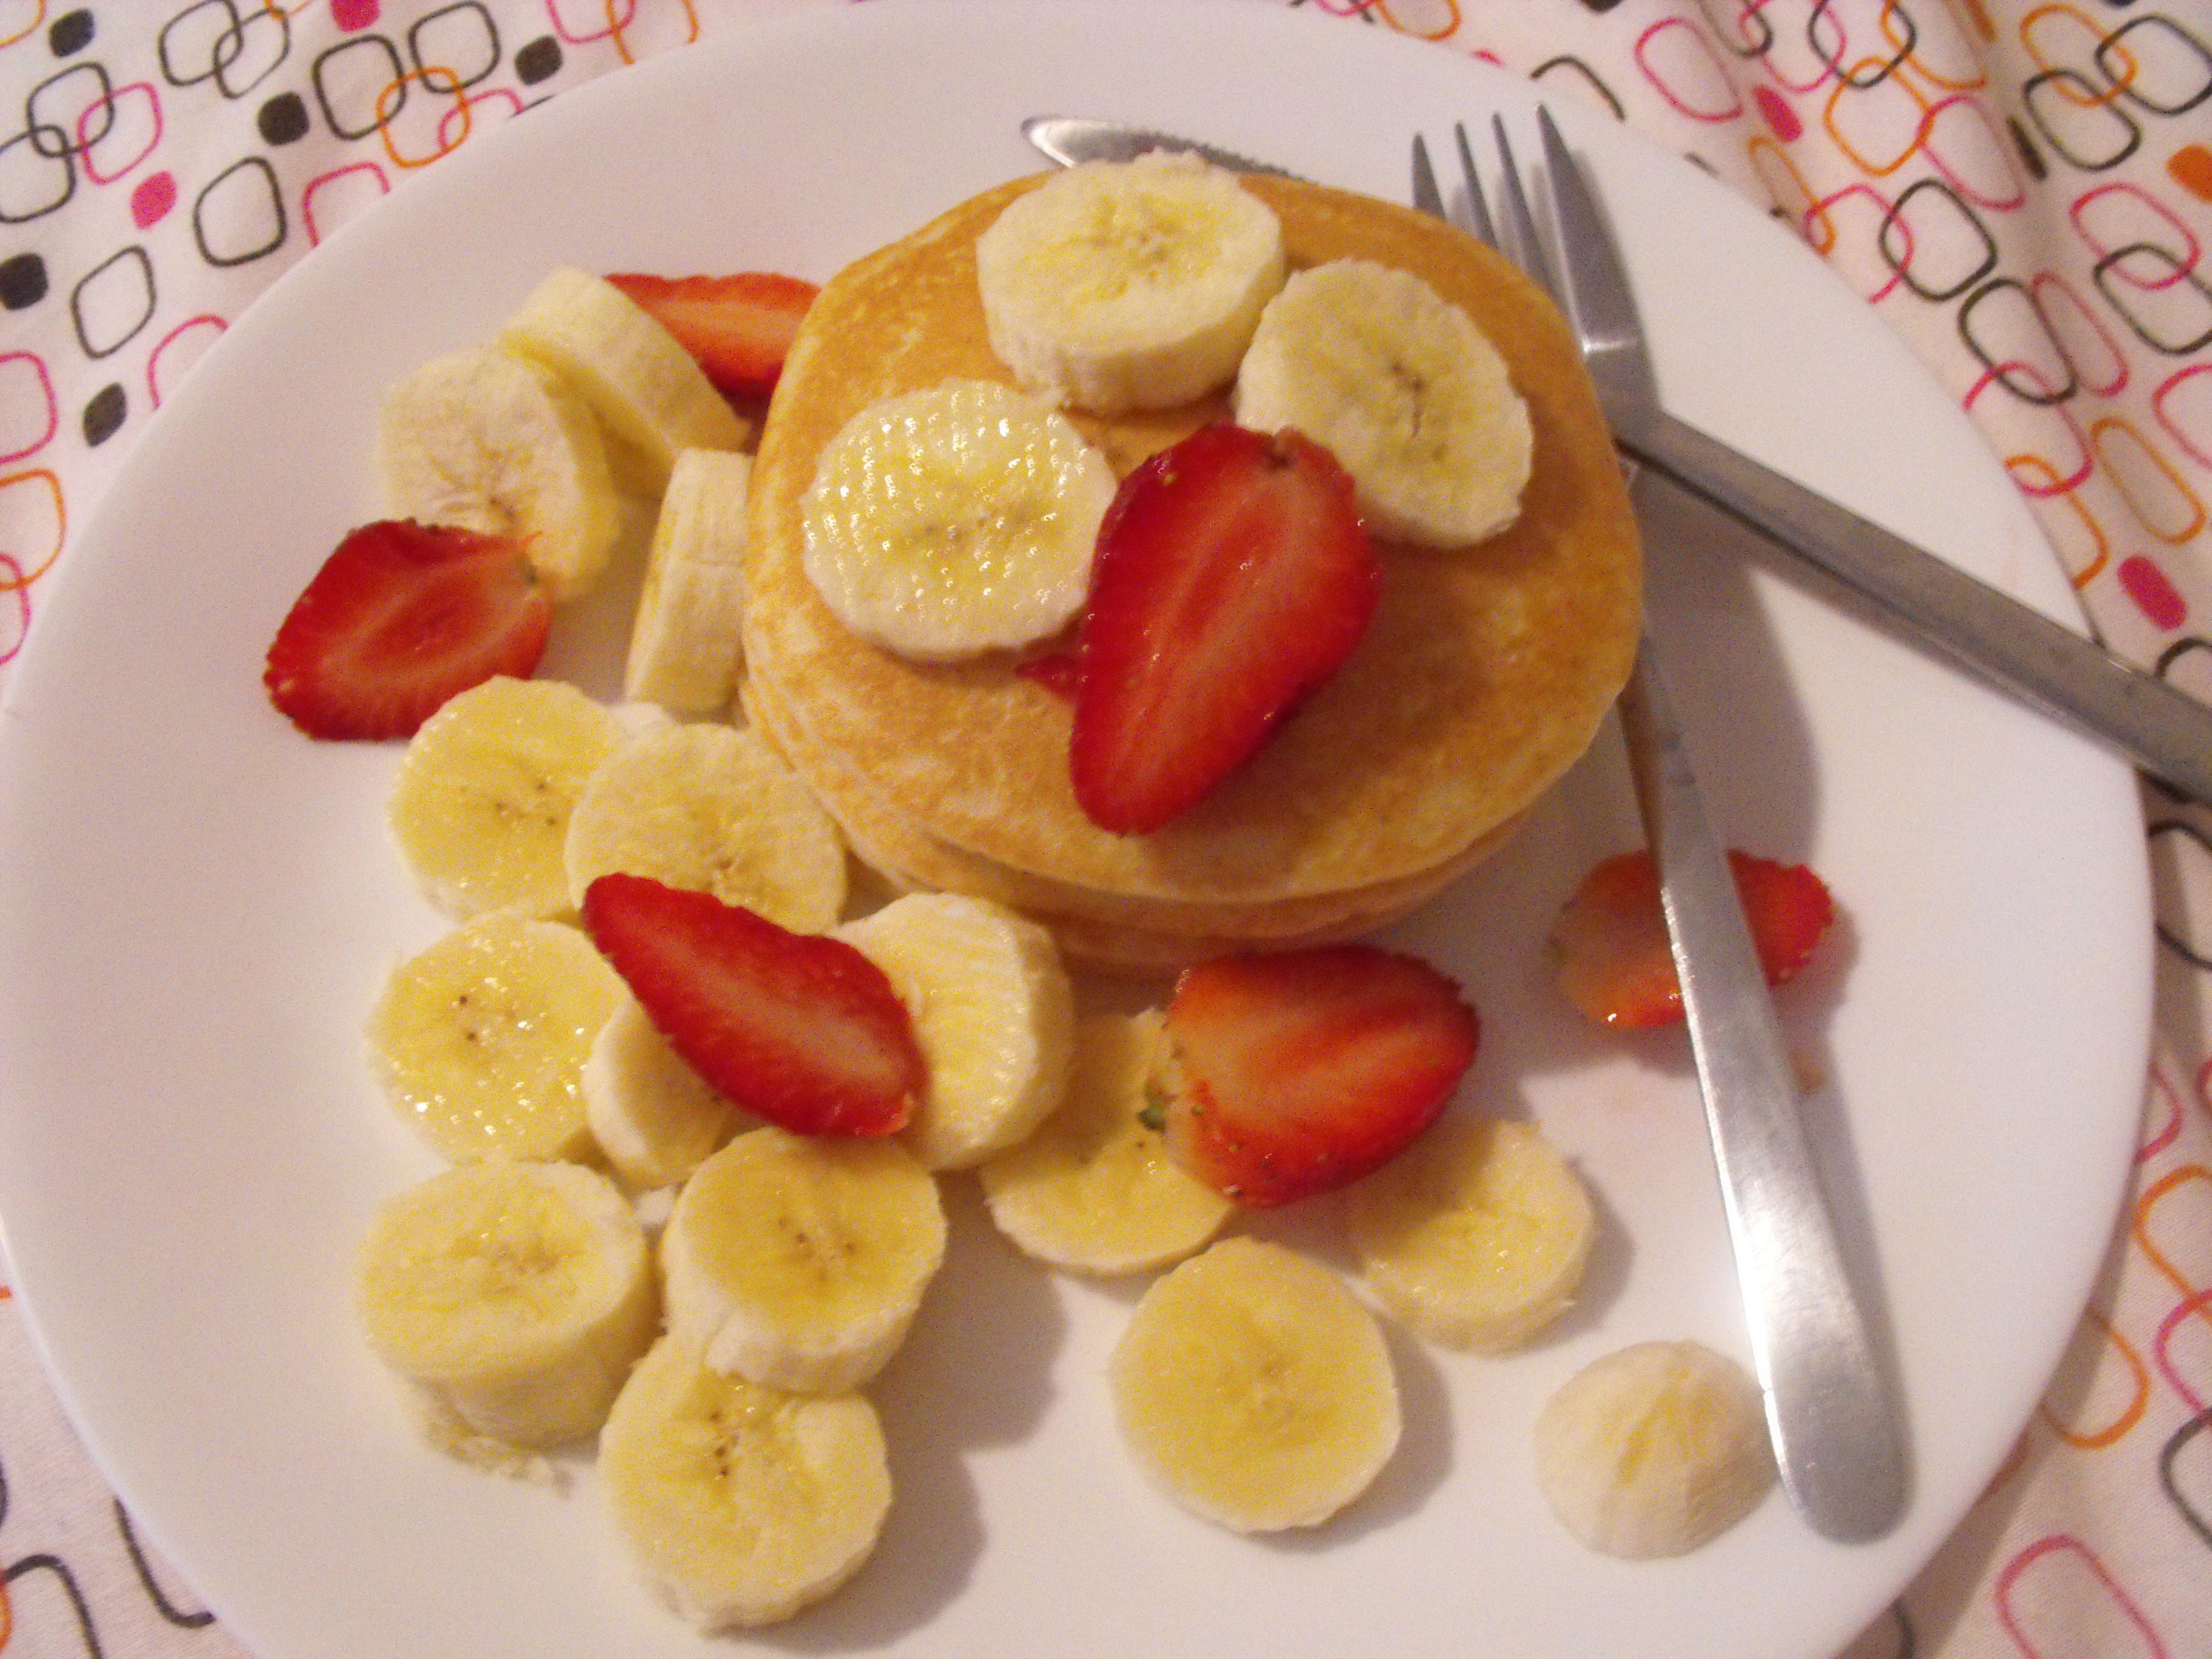 http://foodloader.net/cutie_2010-01-04_pancakes.jpg